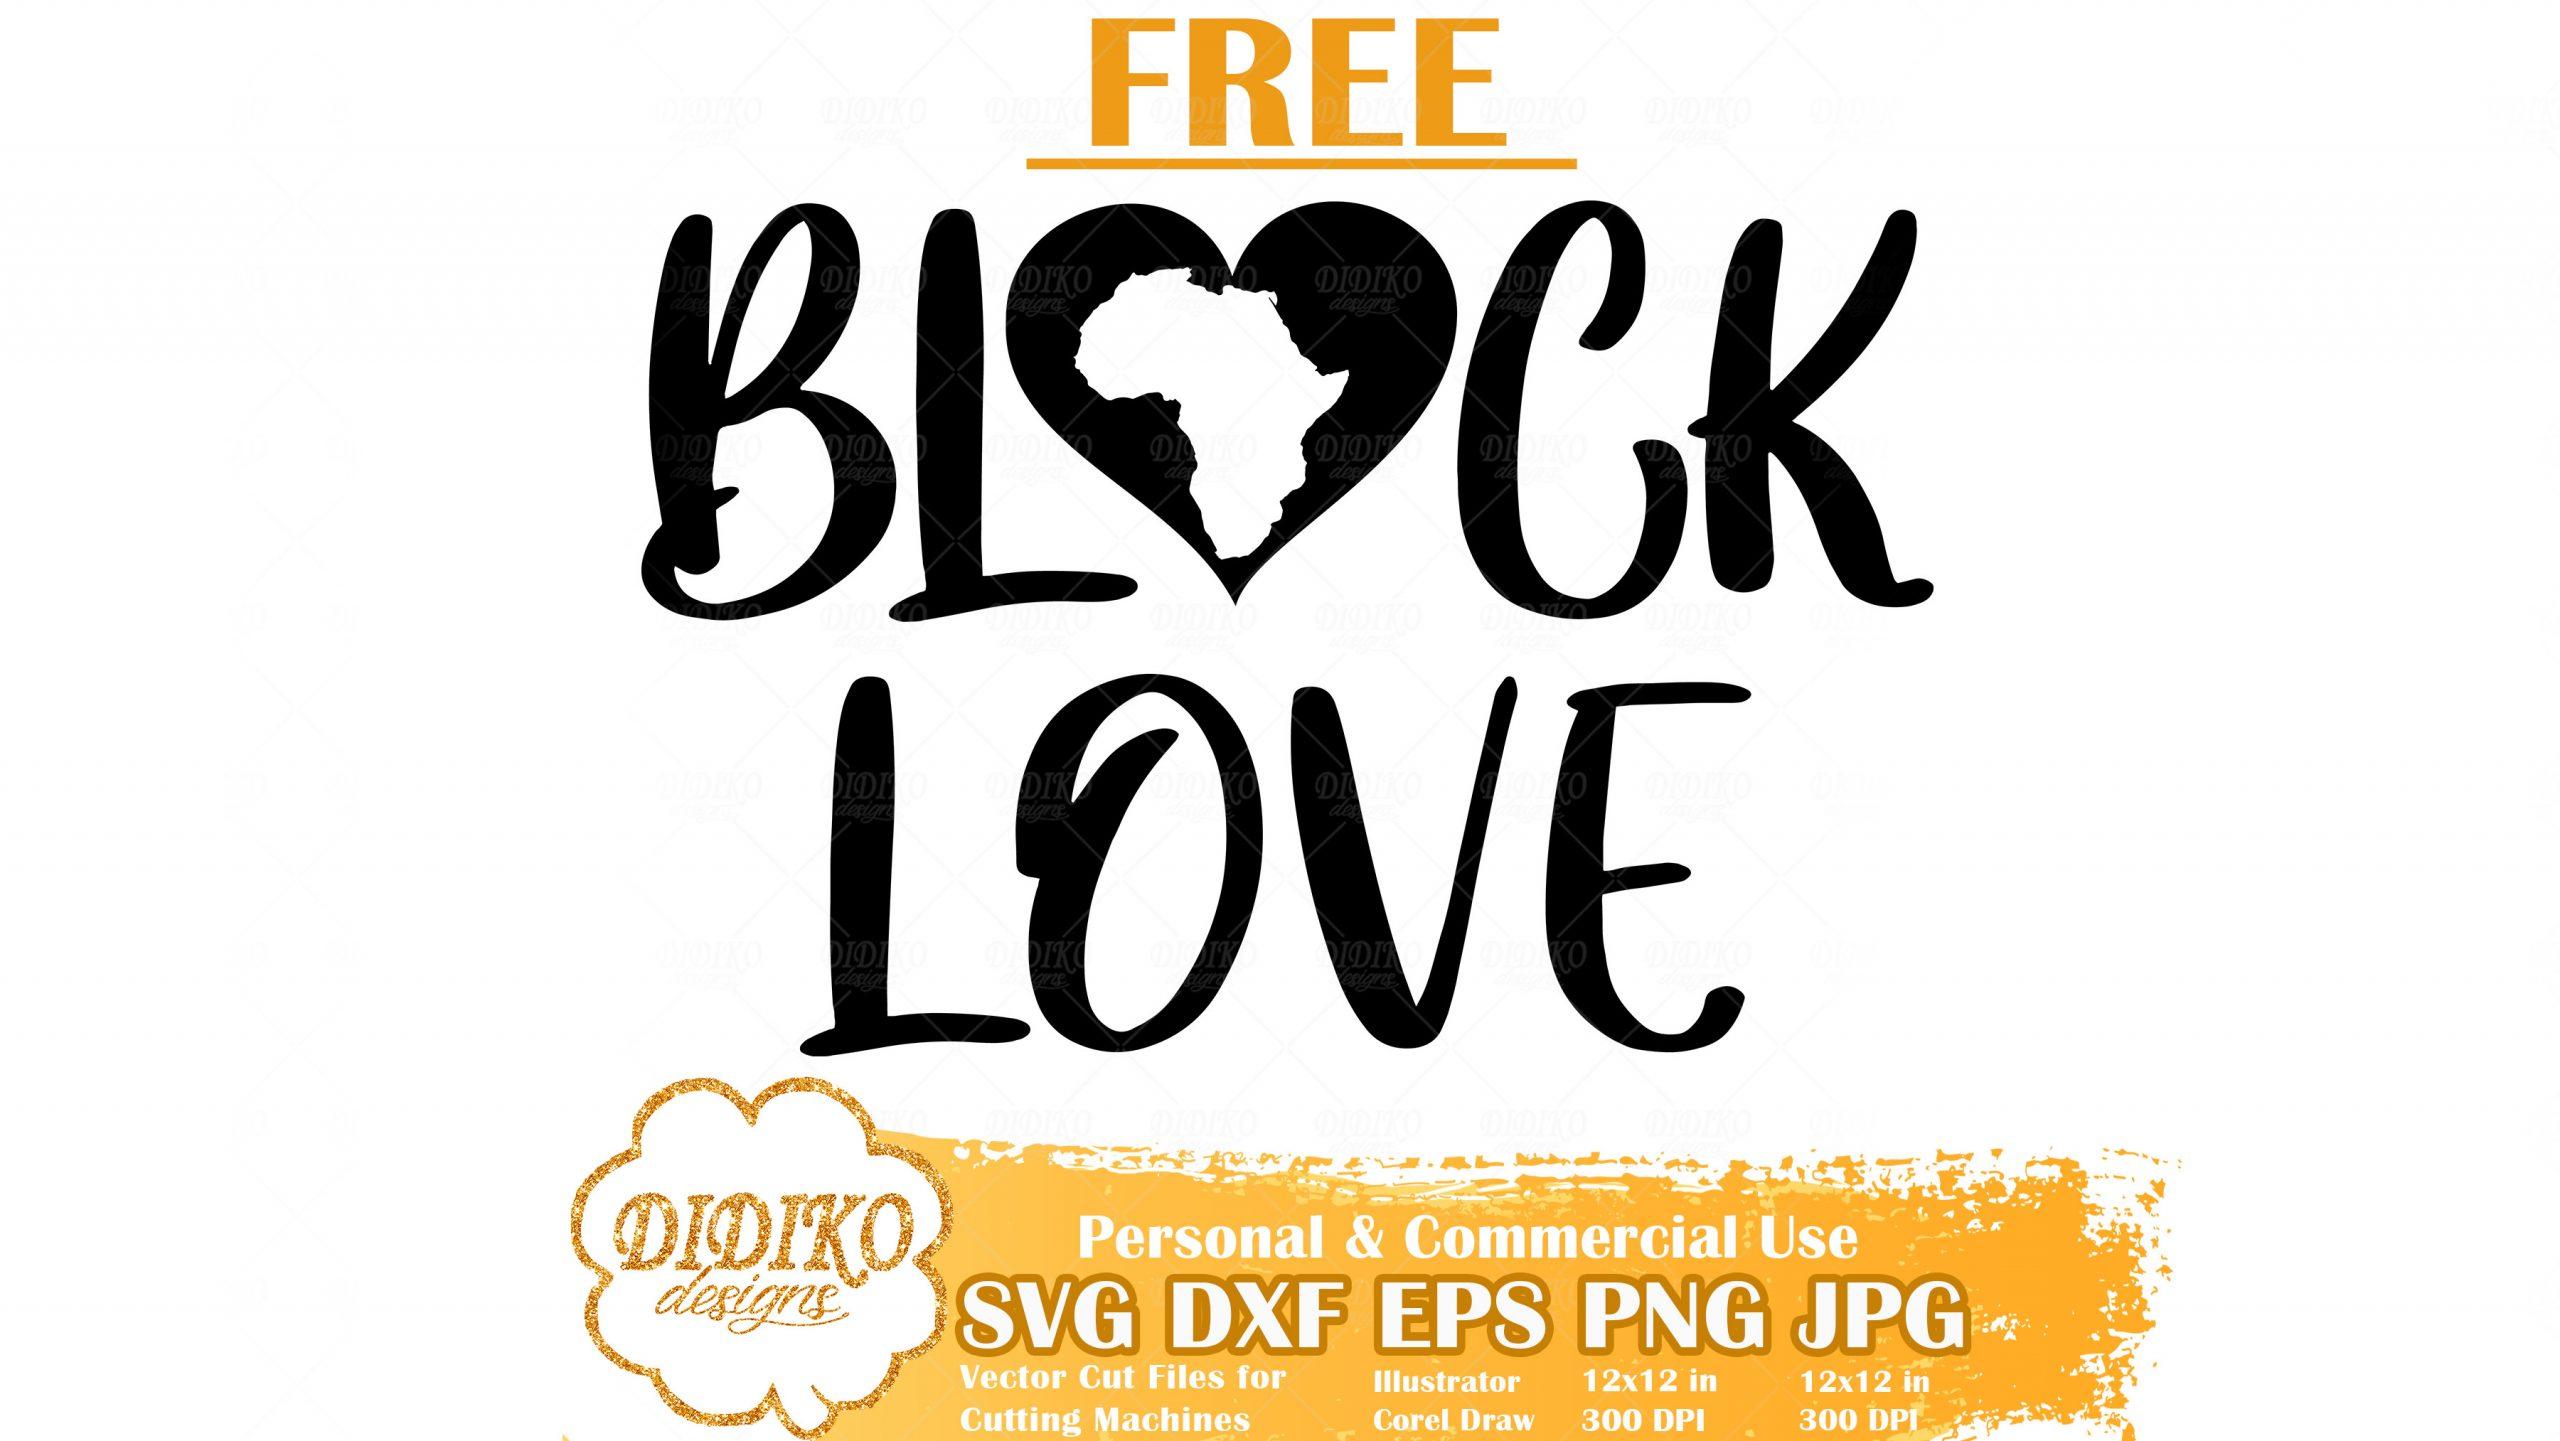 Free Black Love Svg Africa Free Svg Free Black History Svg Africa Heart Svg Cricut File Didiko Designs